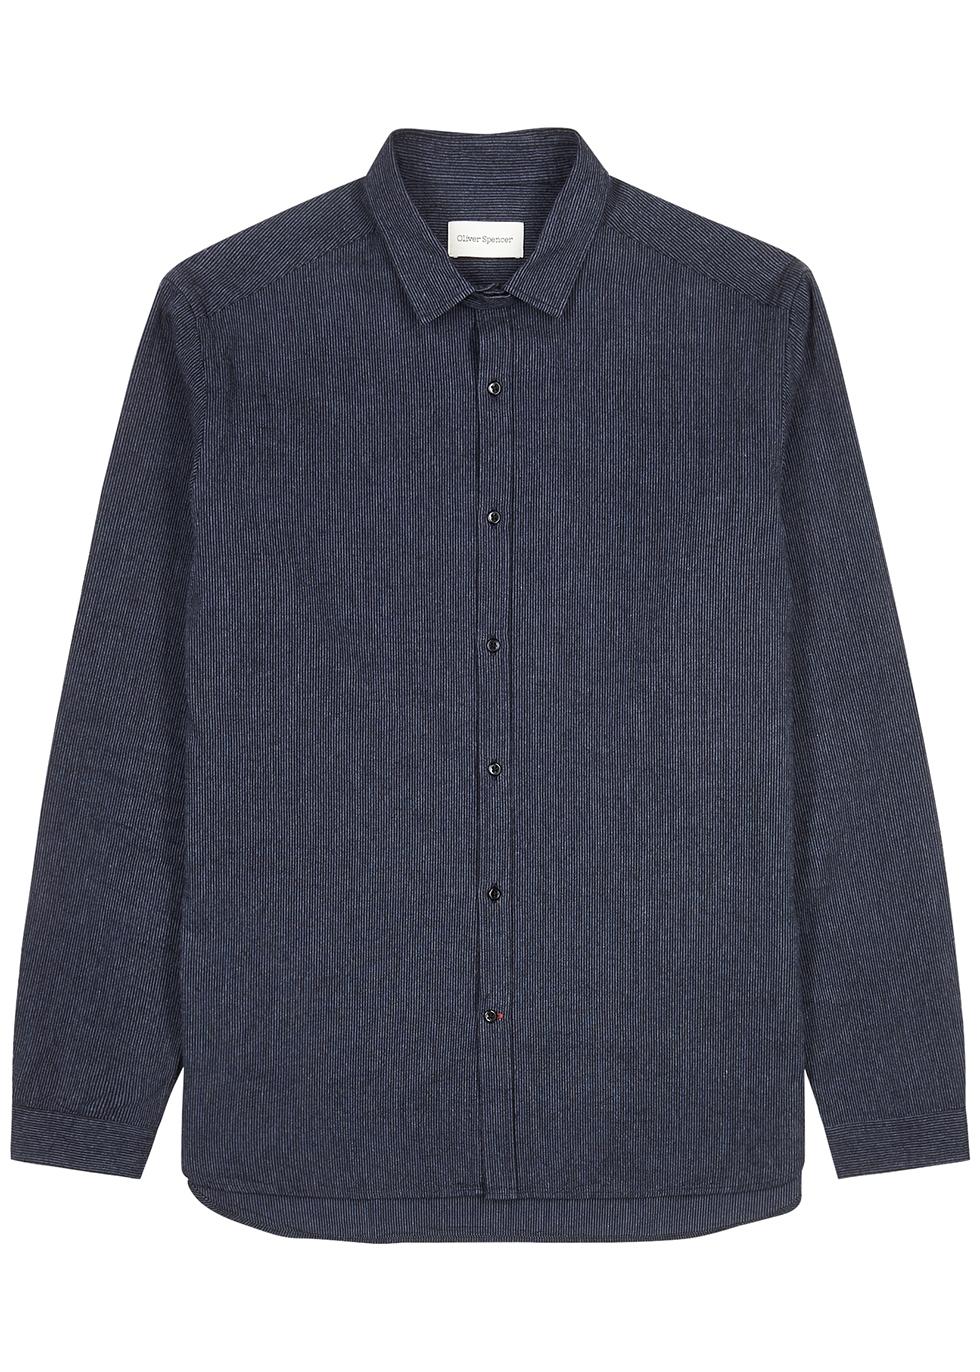 Clerkenwell navy striped cotton shirt